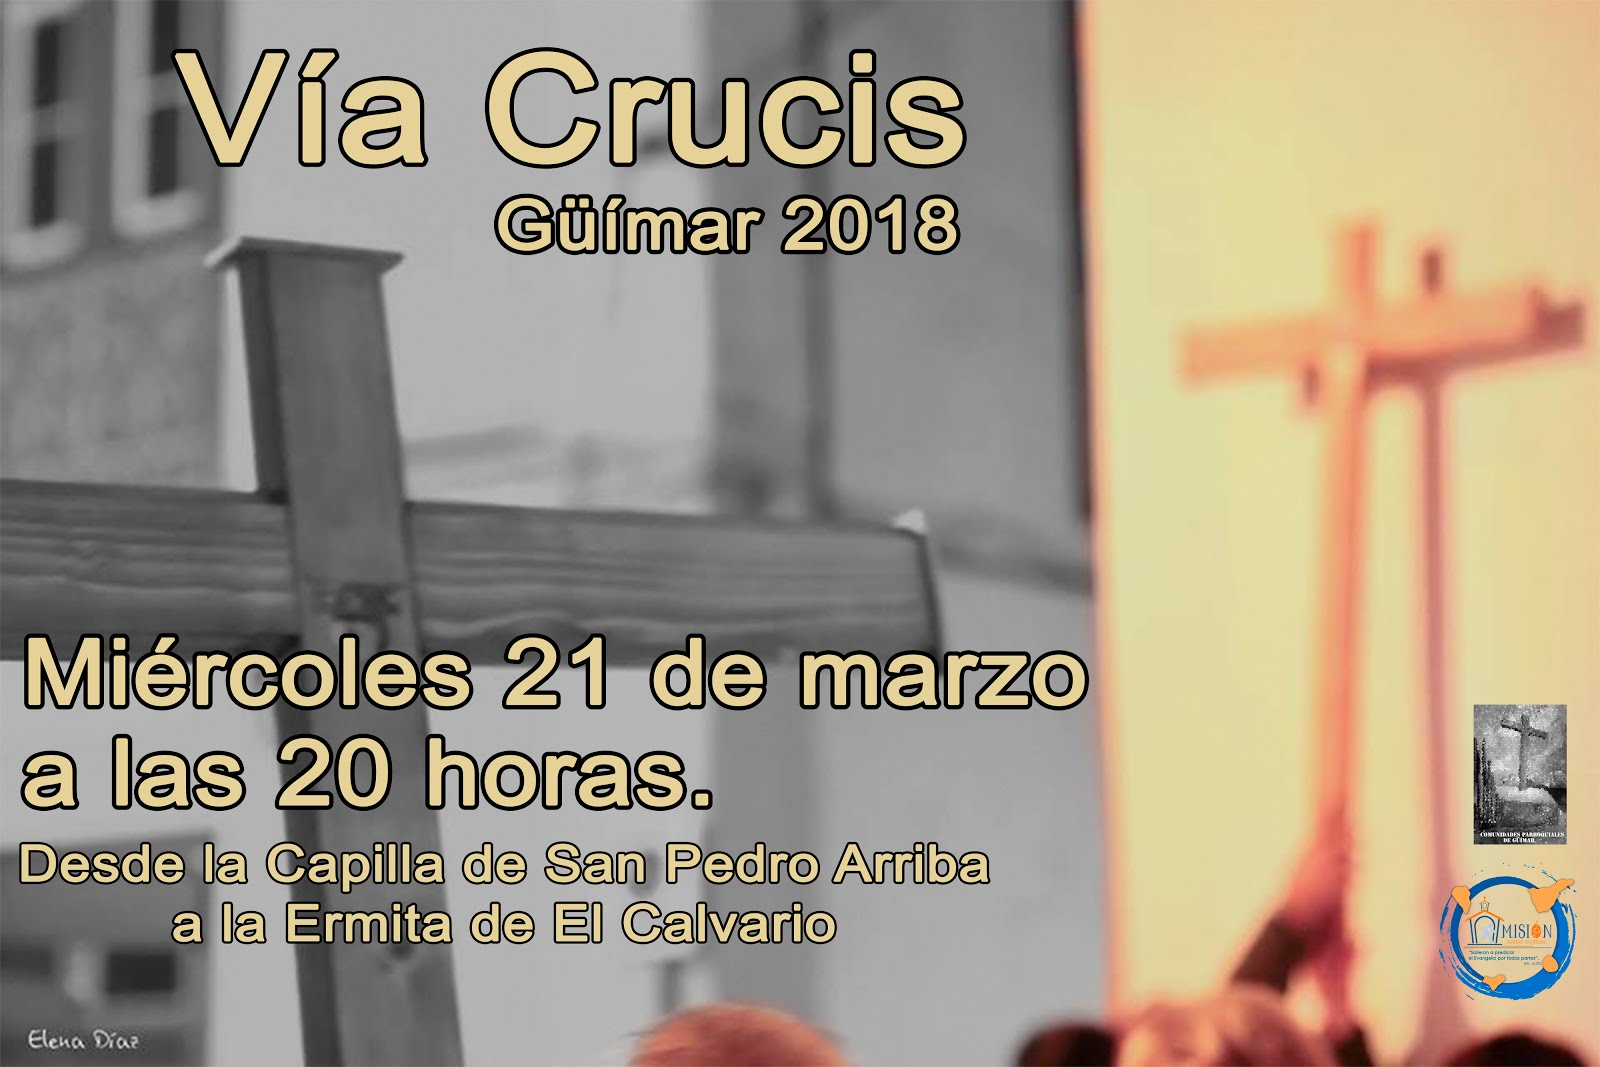 Vía Crucis Güímar 2018